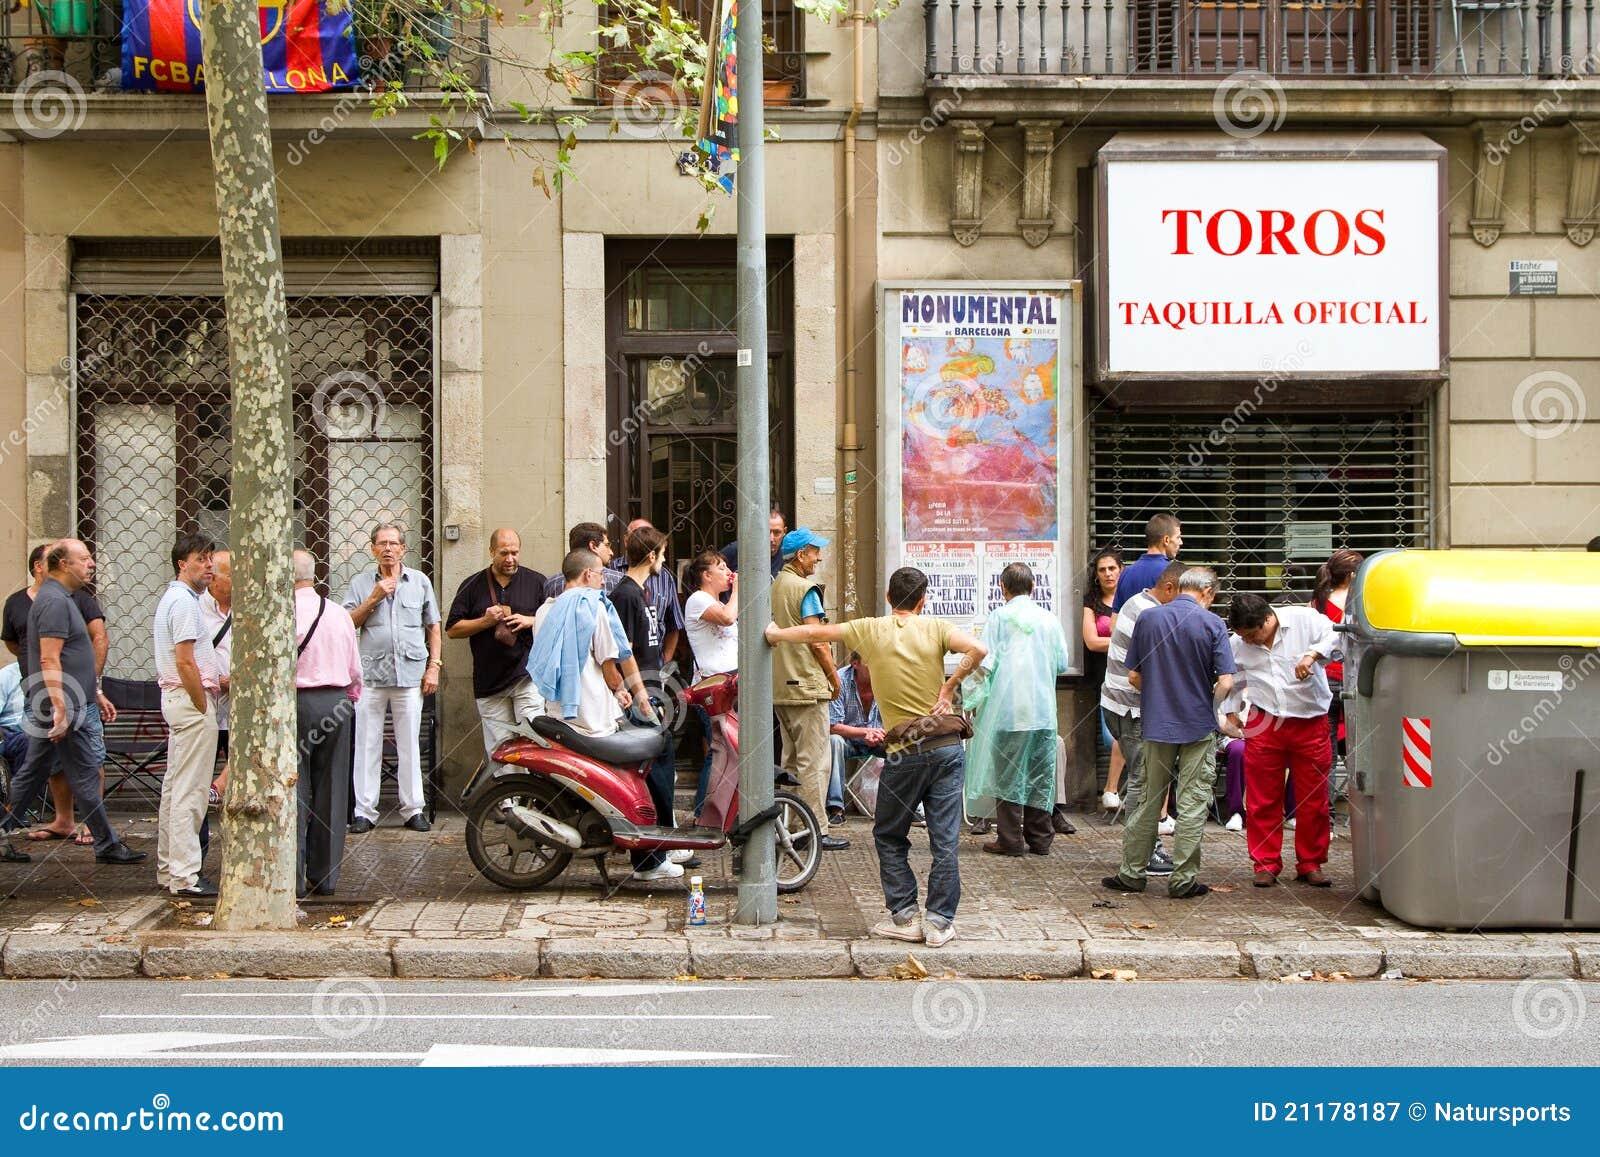 Queue for bullfight